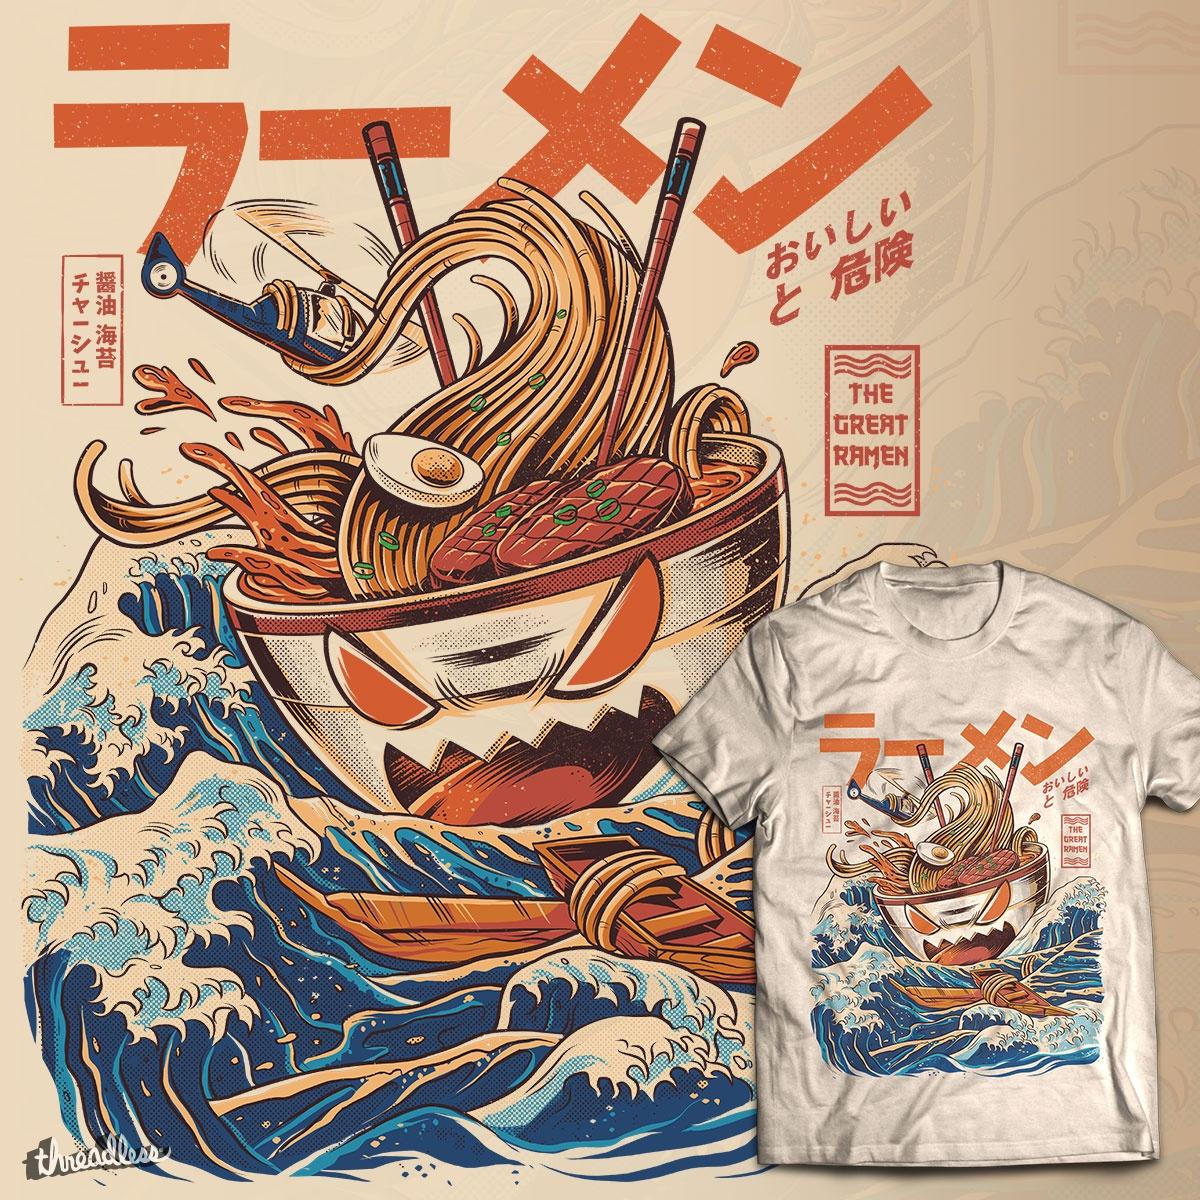 The Great Ramen off Kanagawa by Ilustrata on Threadless